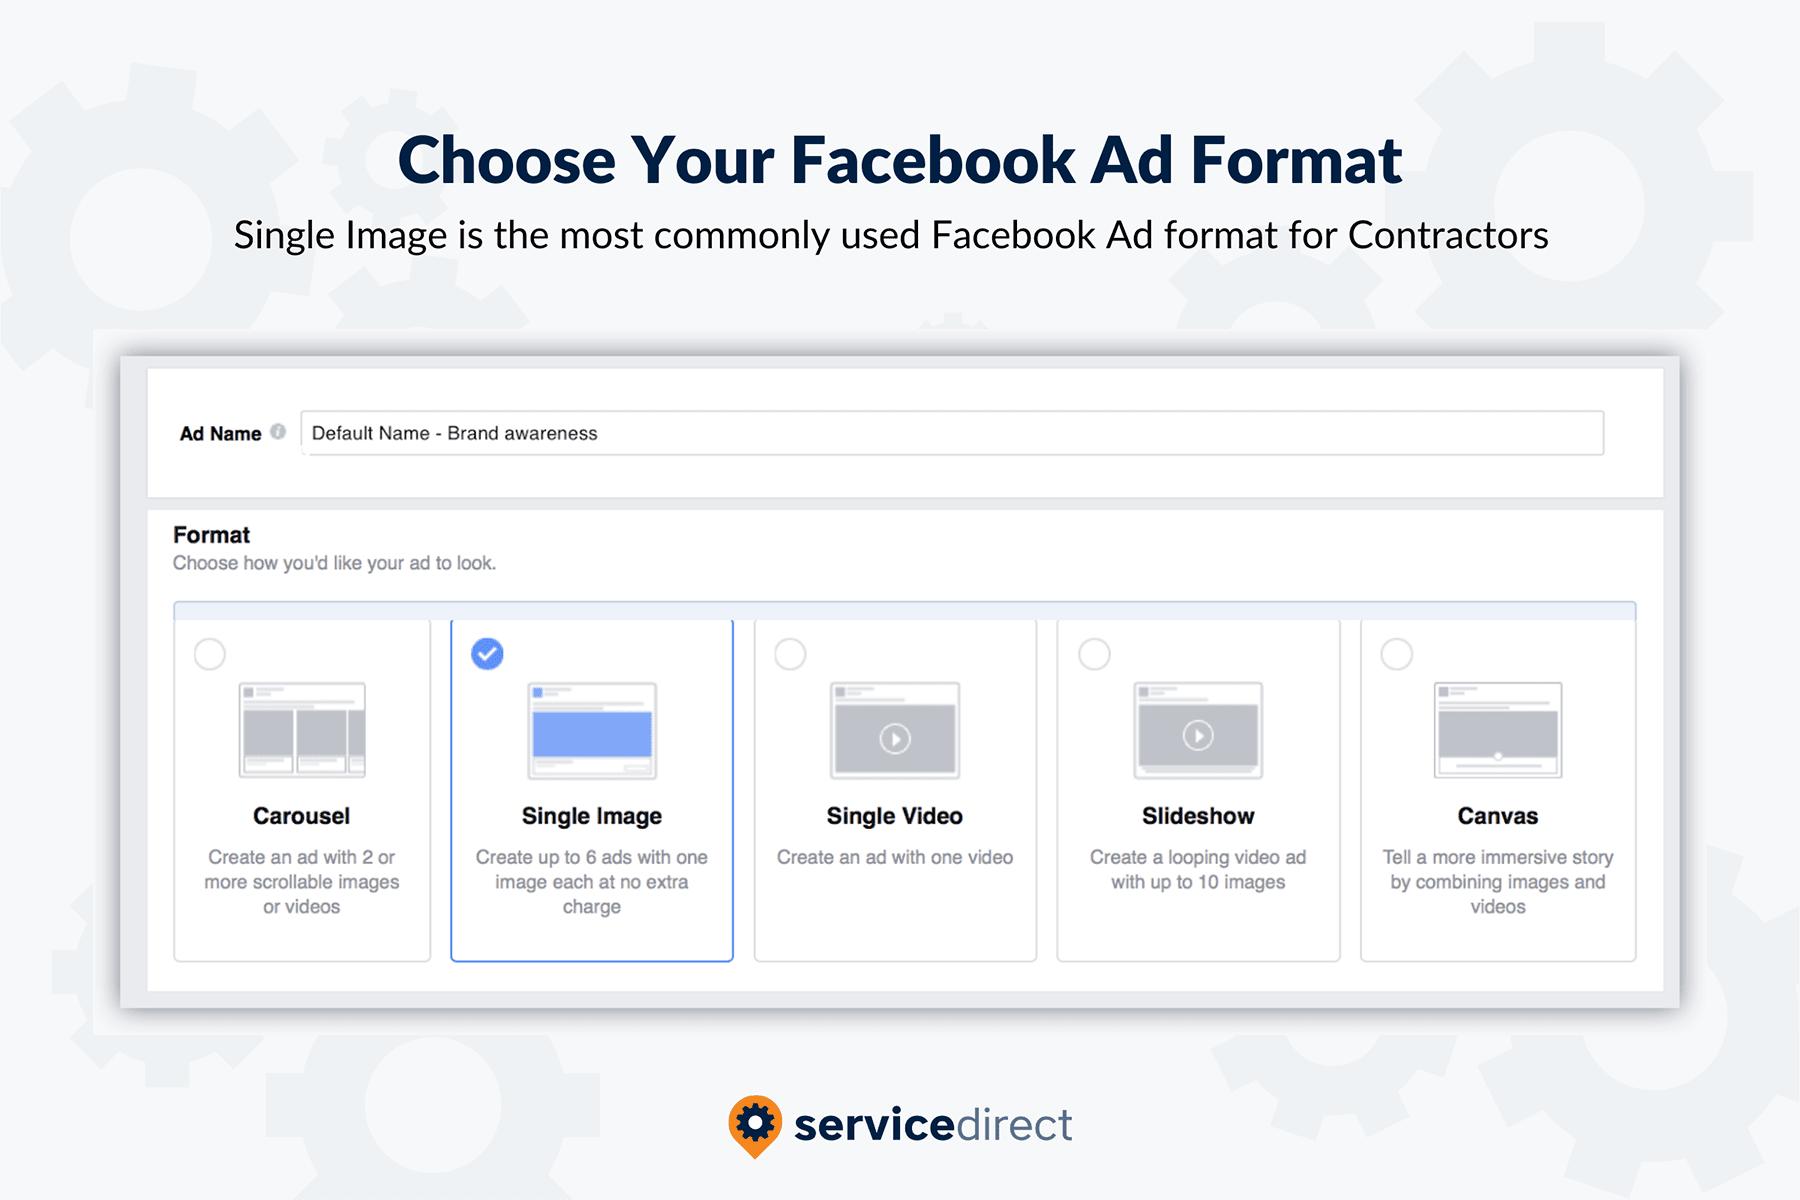 Facebook Ad Formats for Contractors